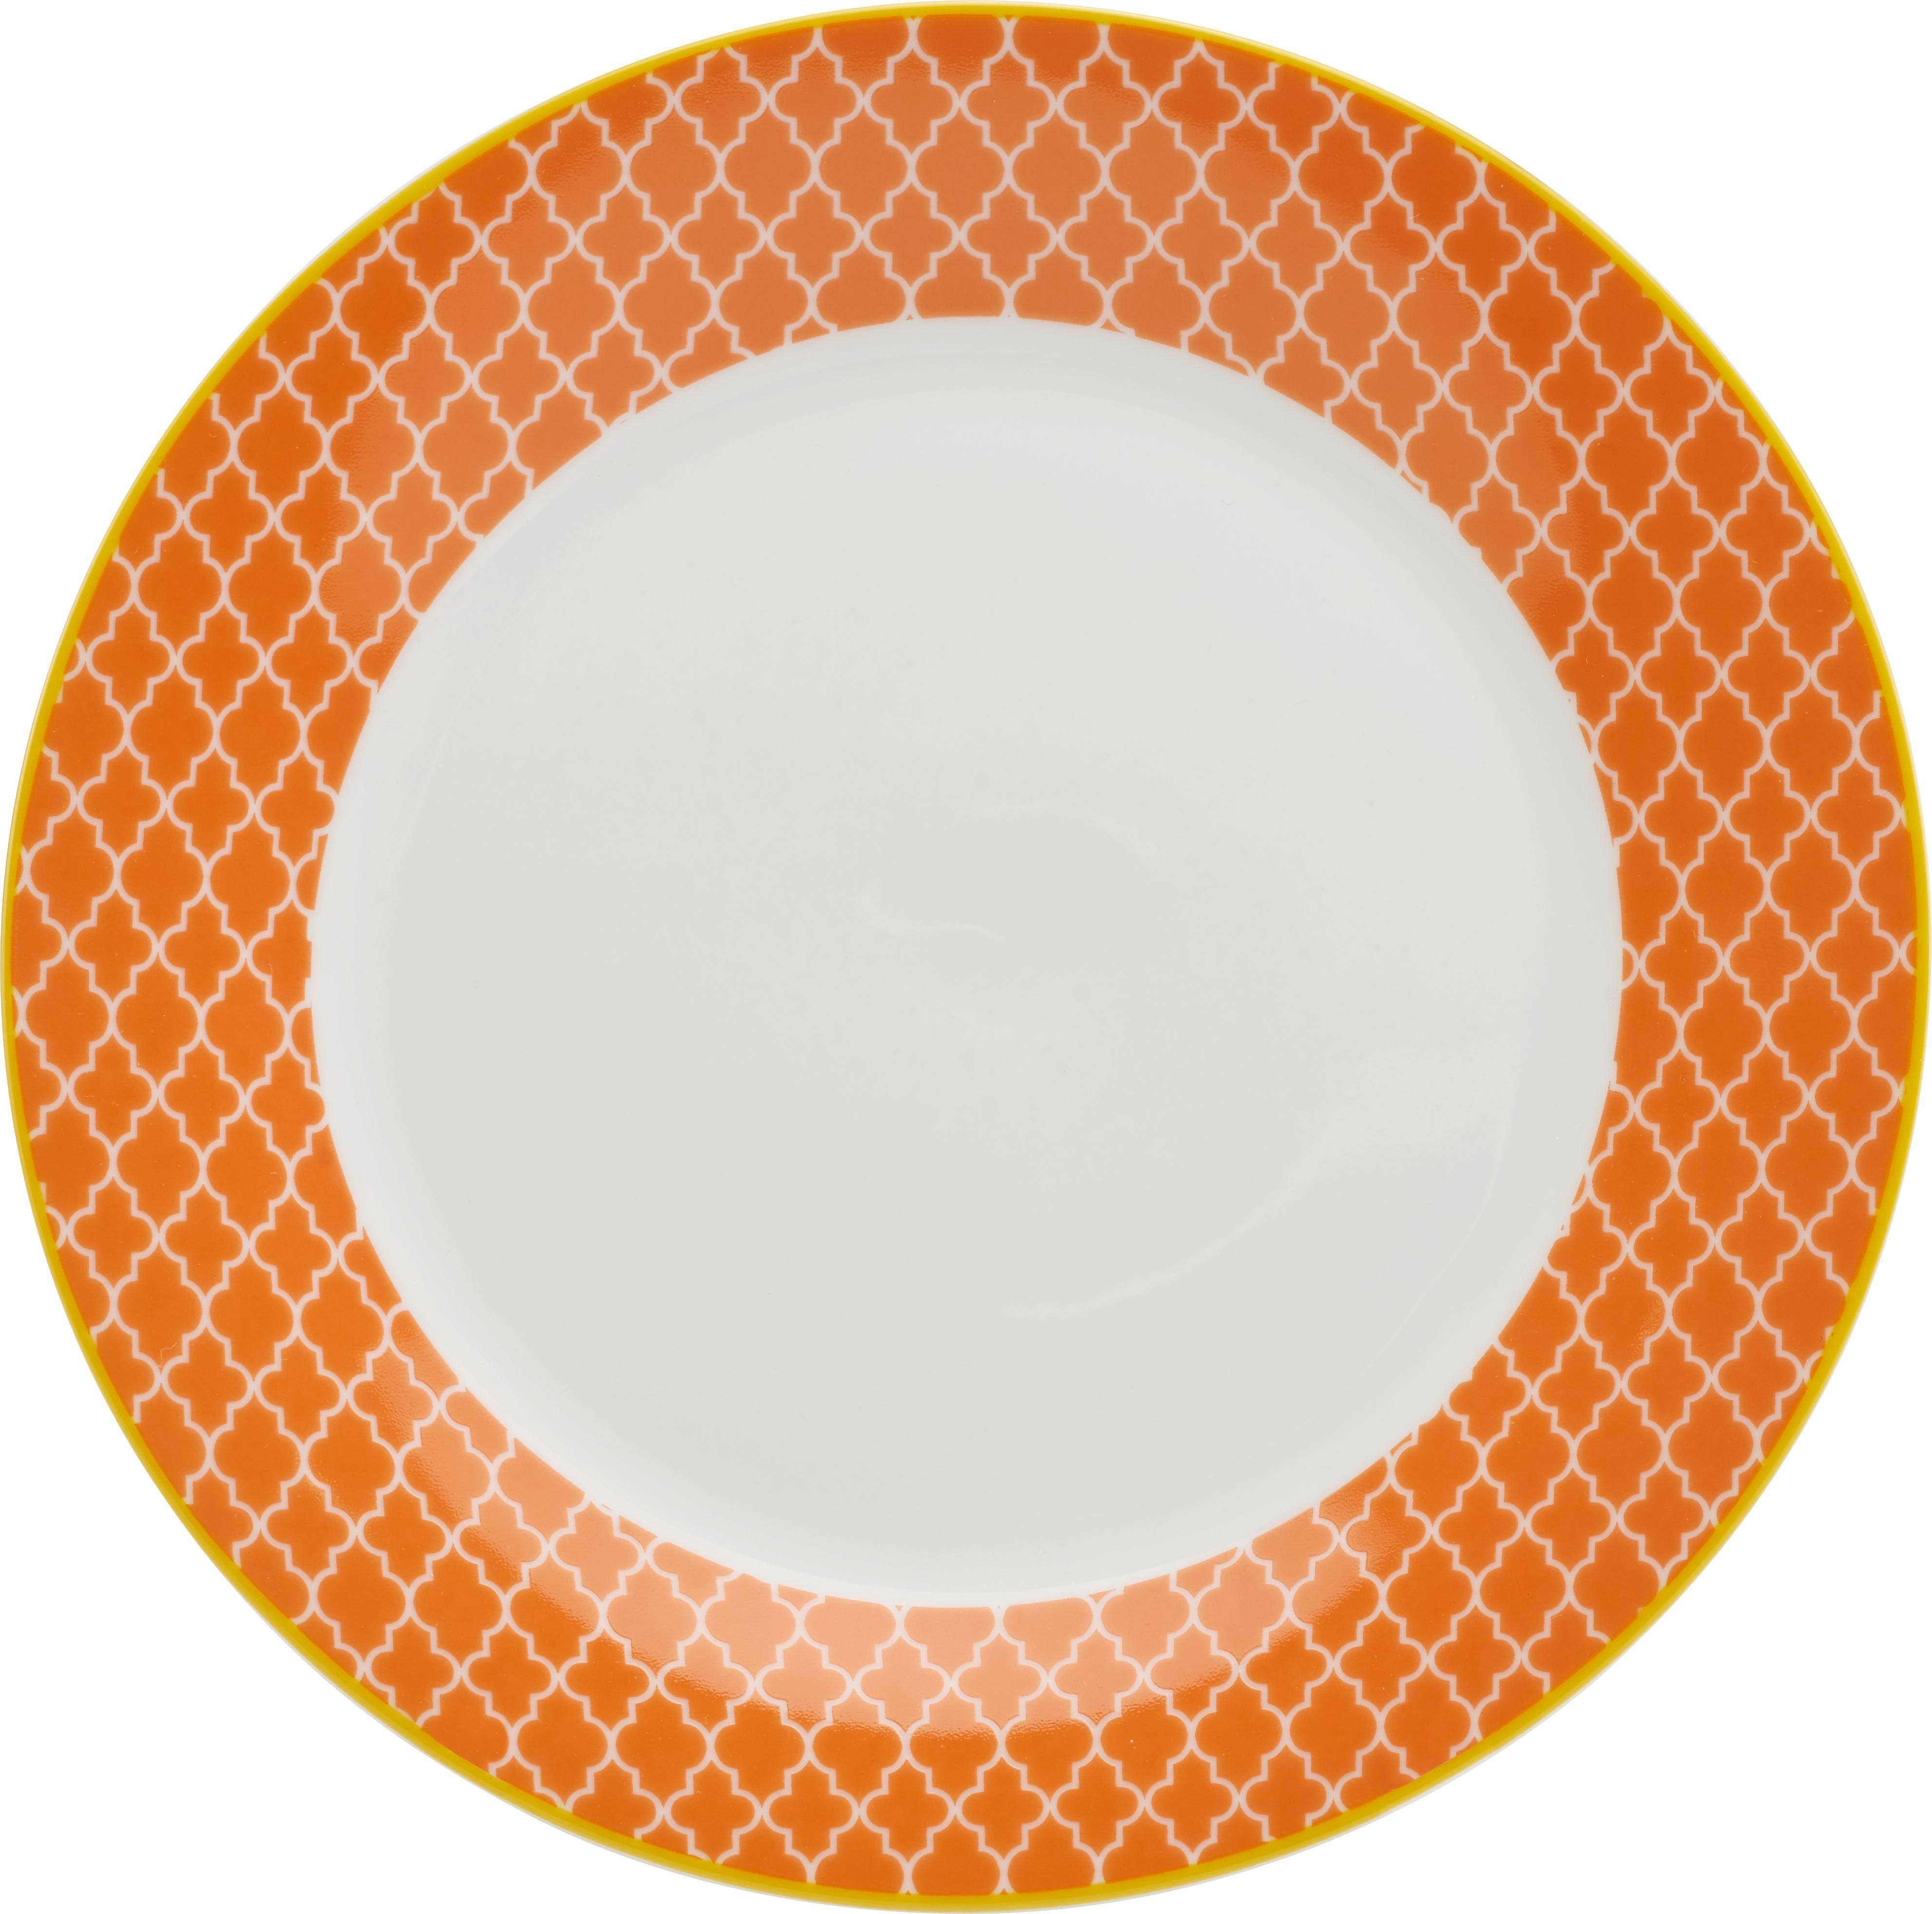 Dessertteller Sahara in Orange aus Porzellan - Gelb/Orange, LIFESTYLE, Keramik (20,32cm) - MÖMAX modern living